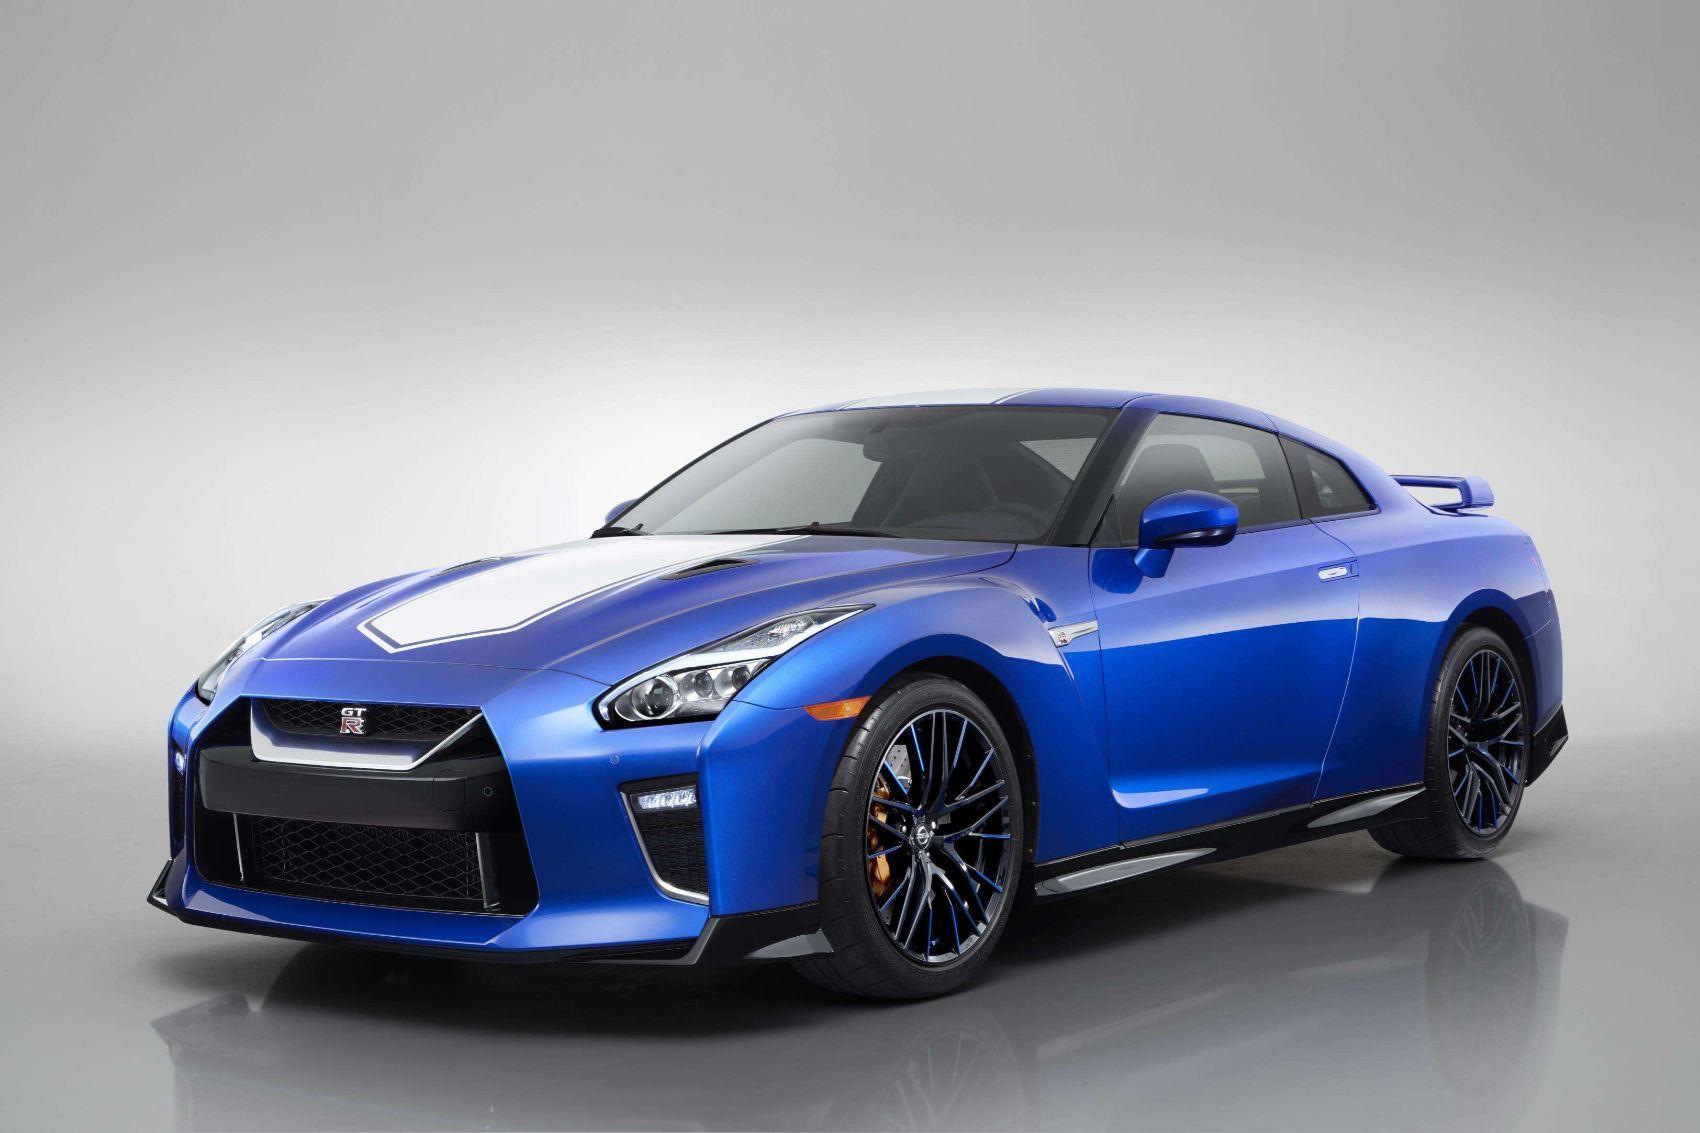 2020 Nissan GT-R 50th Anniversary & GT-R NISMO: Godzilla ...